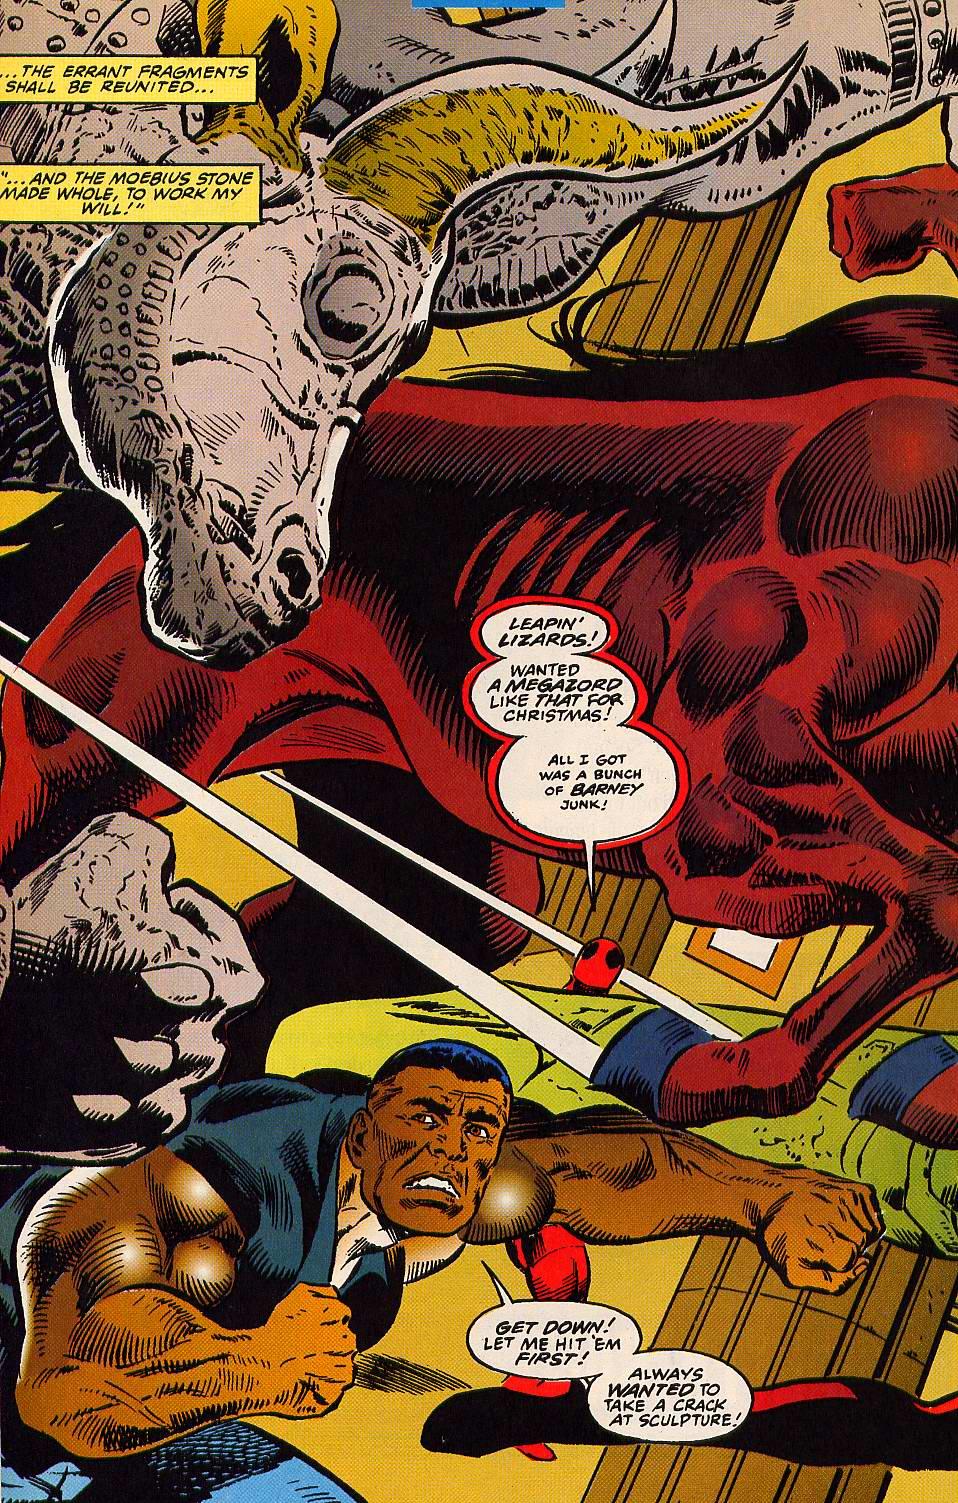 Read online Secret Defenders comic -  Issue #15 - 20